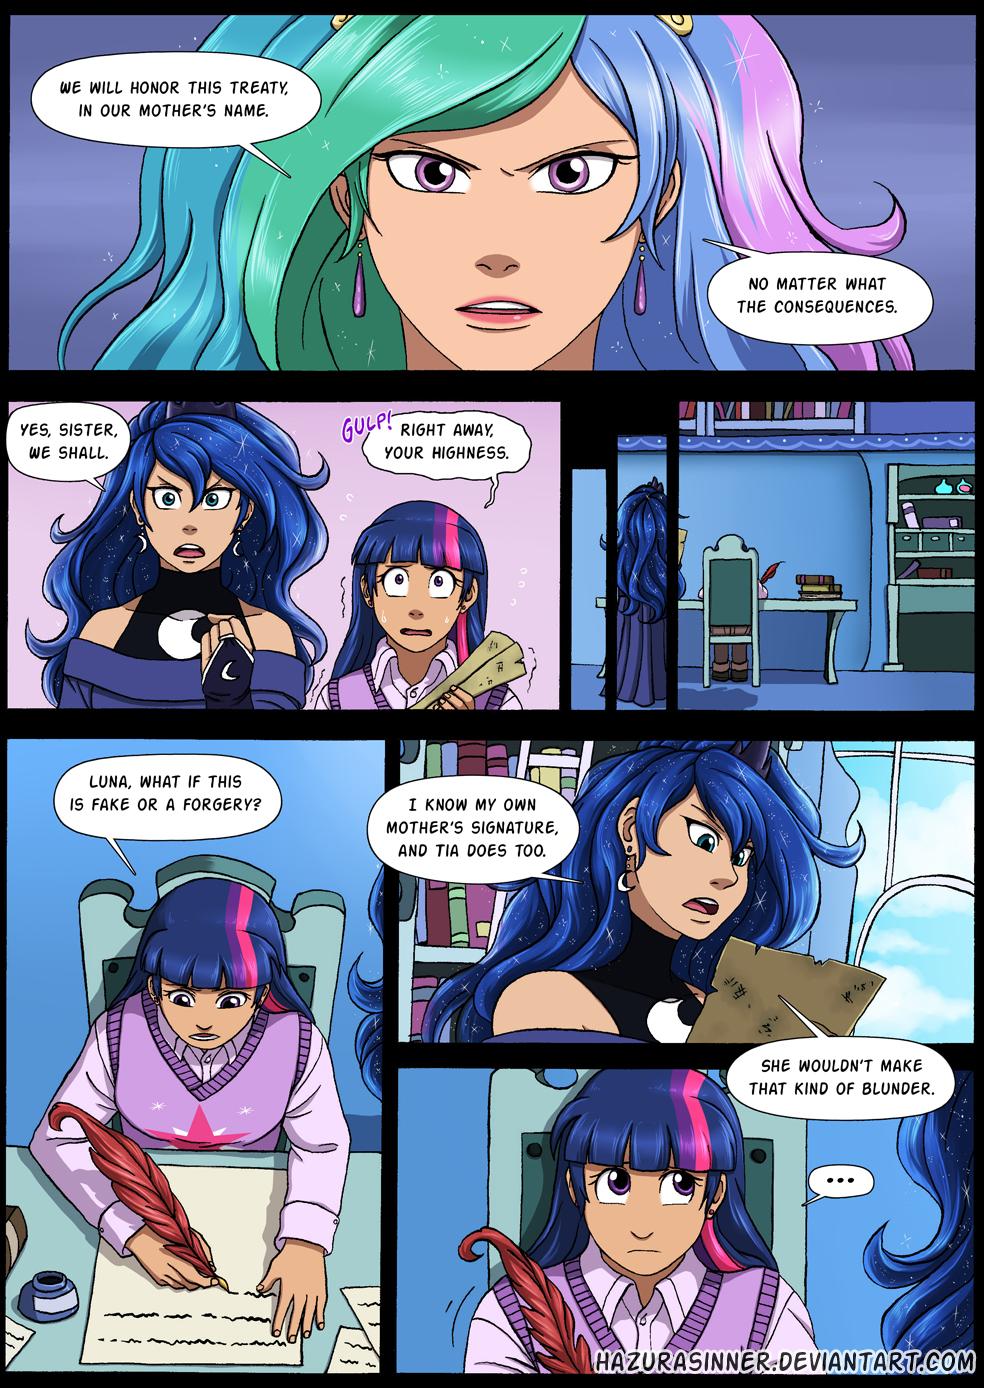 Comic Commission 3 by HazuraSinner